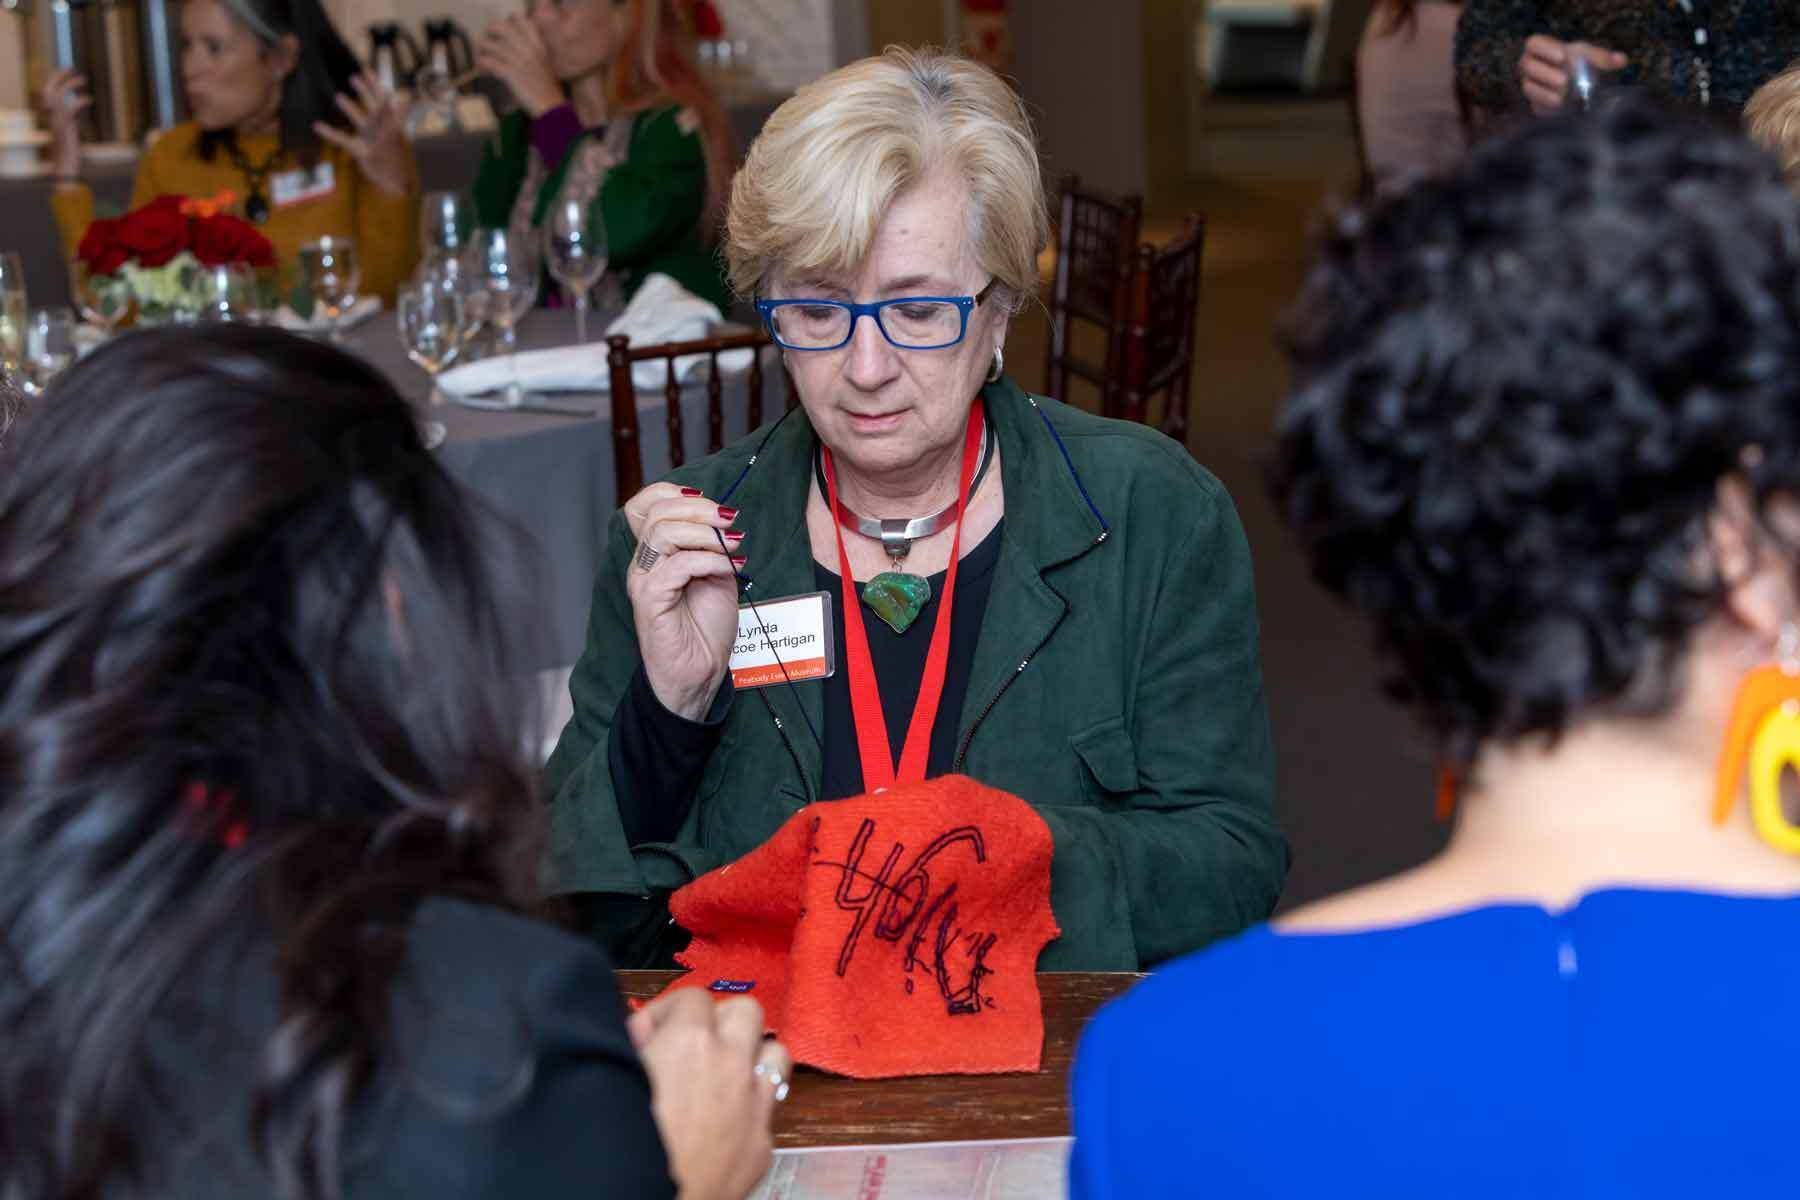 Lynda in a community sewing circle at PEM with Seneca artist Marie Watt. Each/Other: Marie Watt and Cannupa Hanska Luger opens in January. Photo by Kathy Tarantola